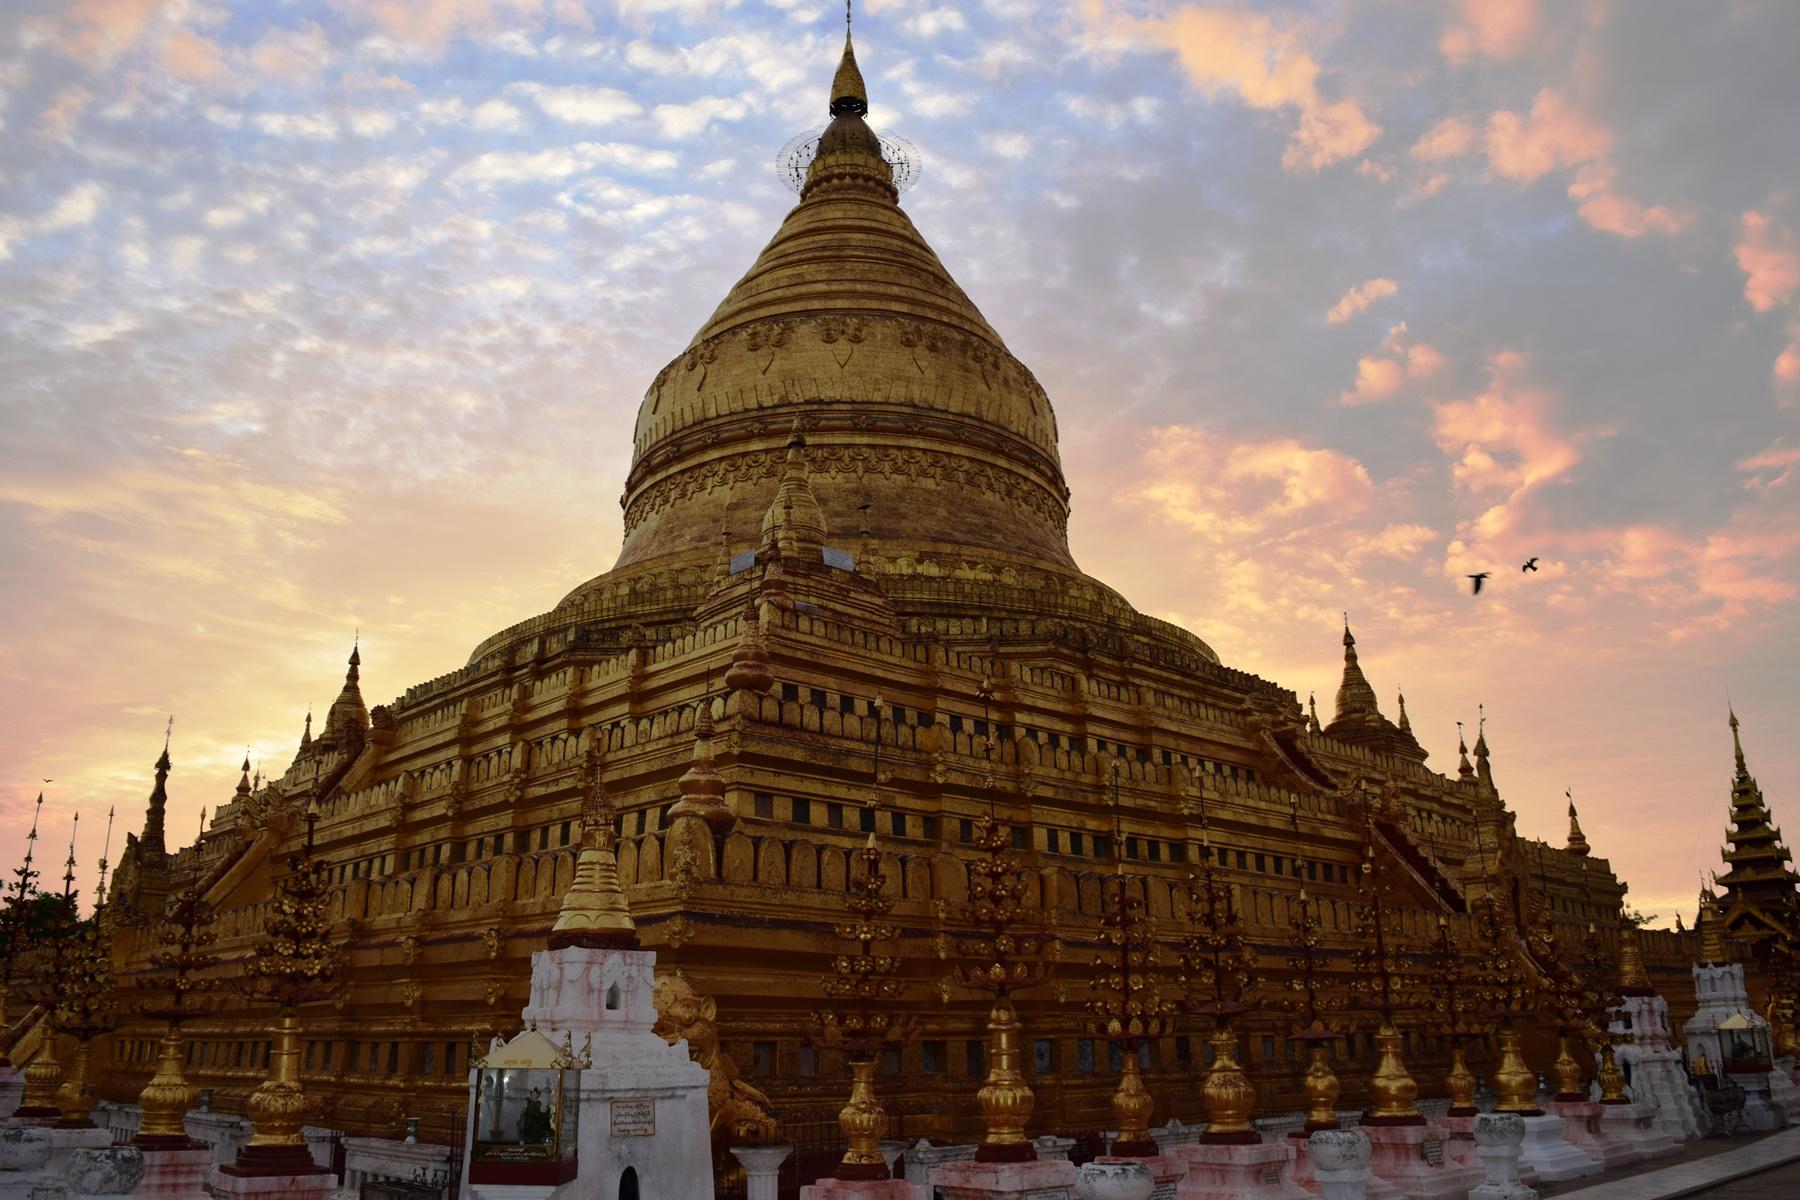 Shwe-zi-gon pagoda, Bagan